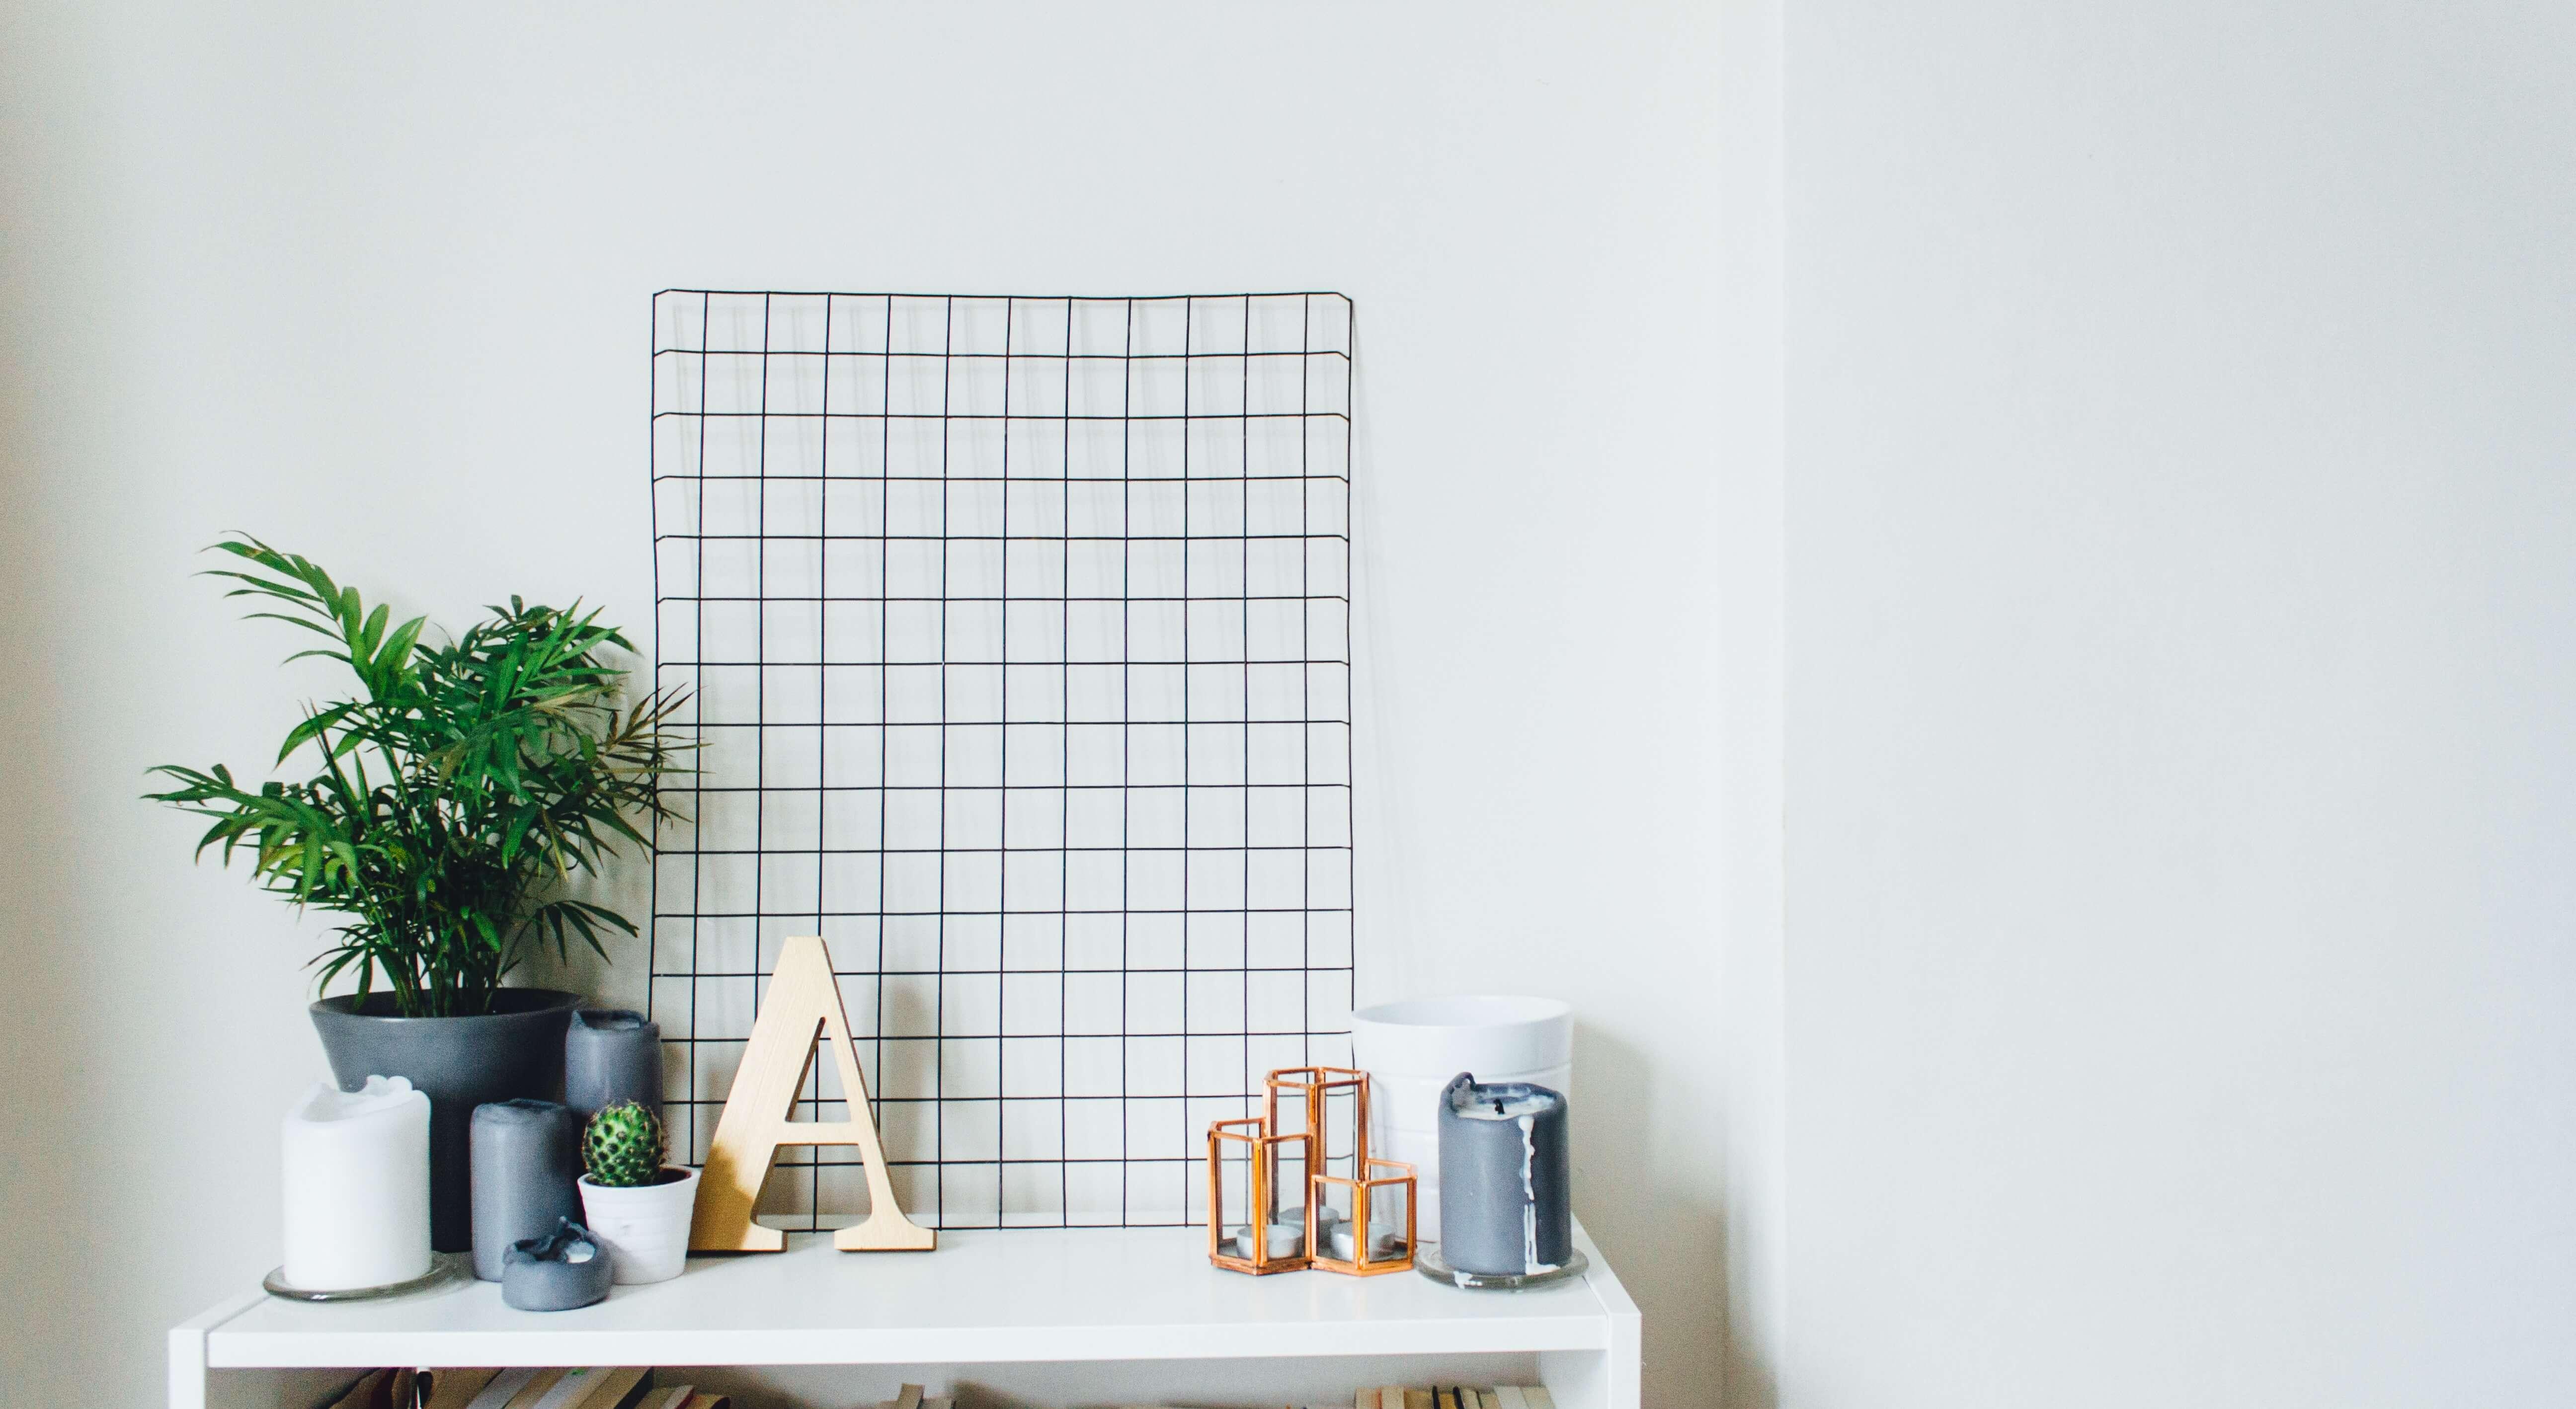 Casa stile minimal: quali sono i dettagli essenziali